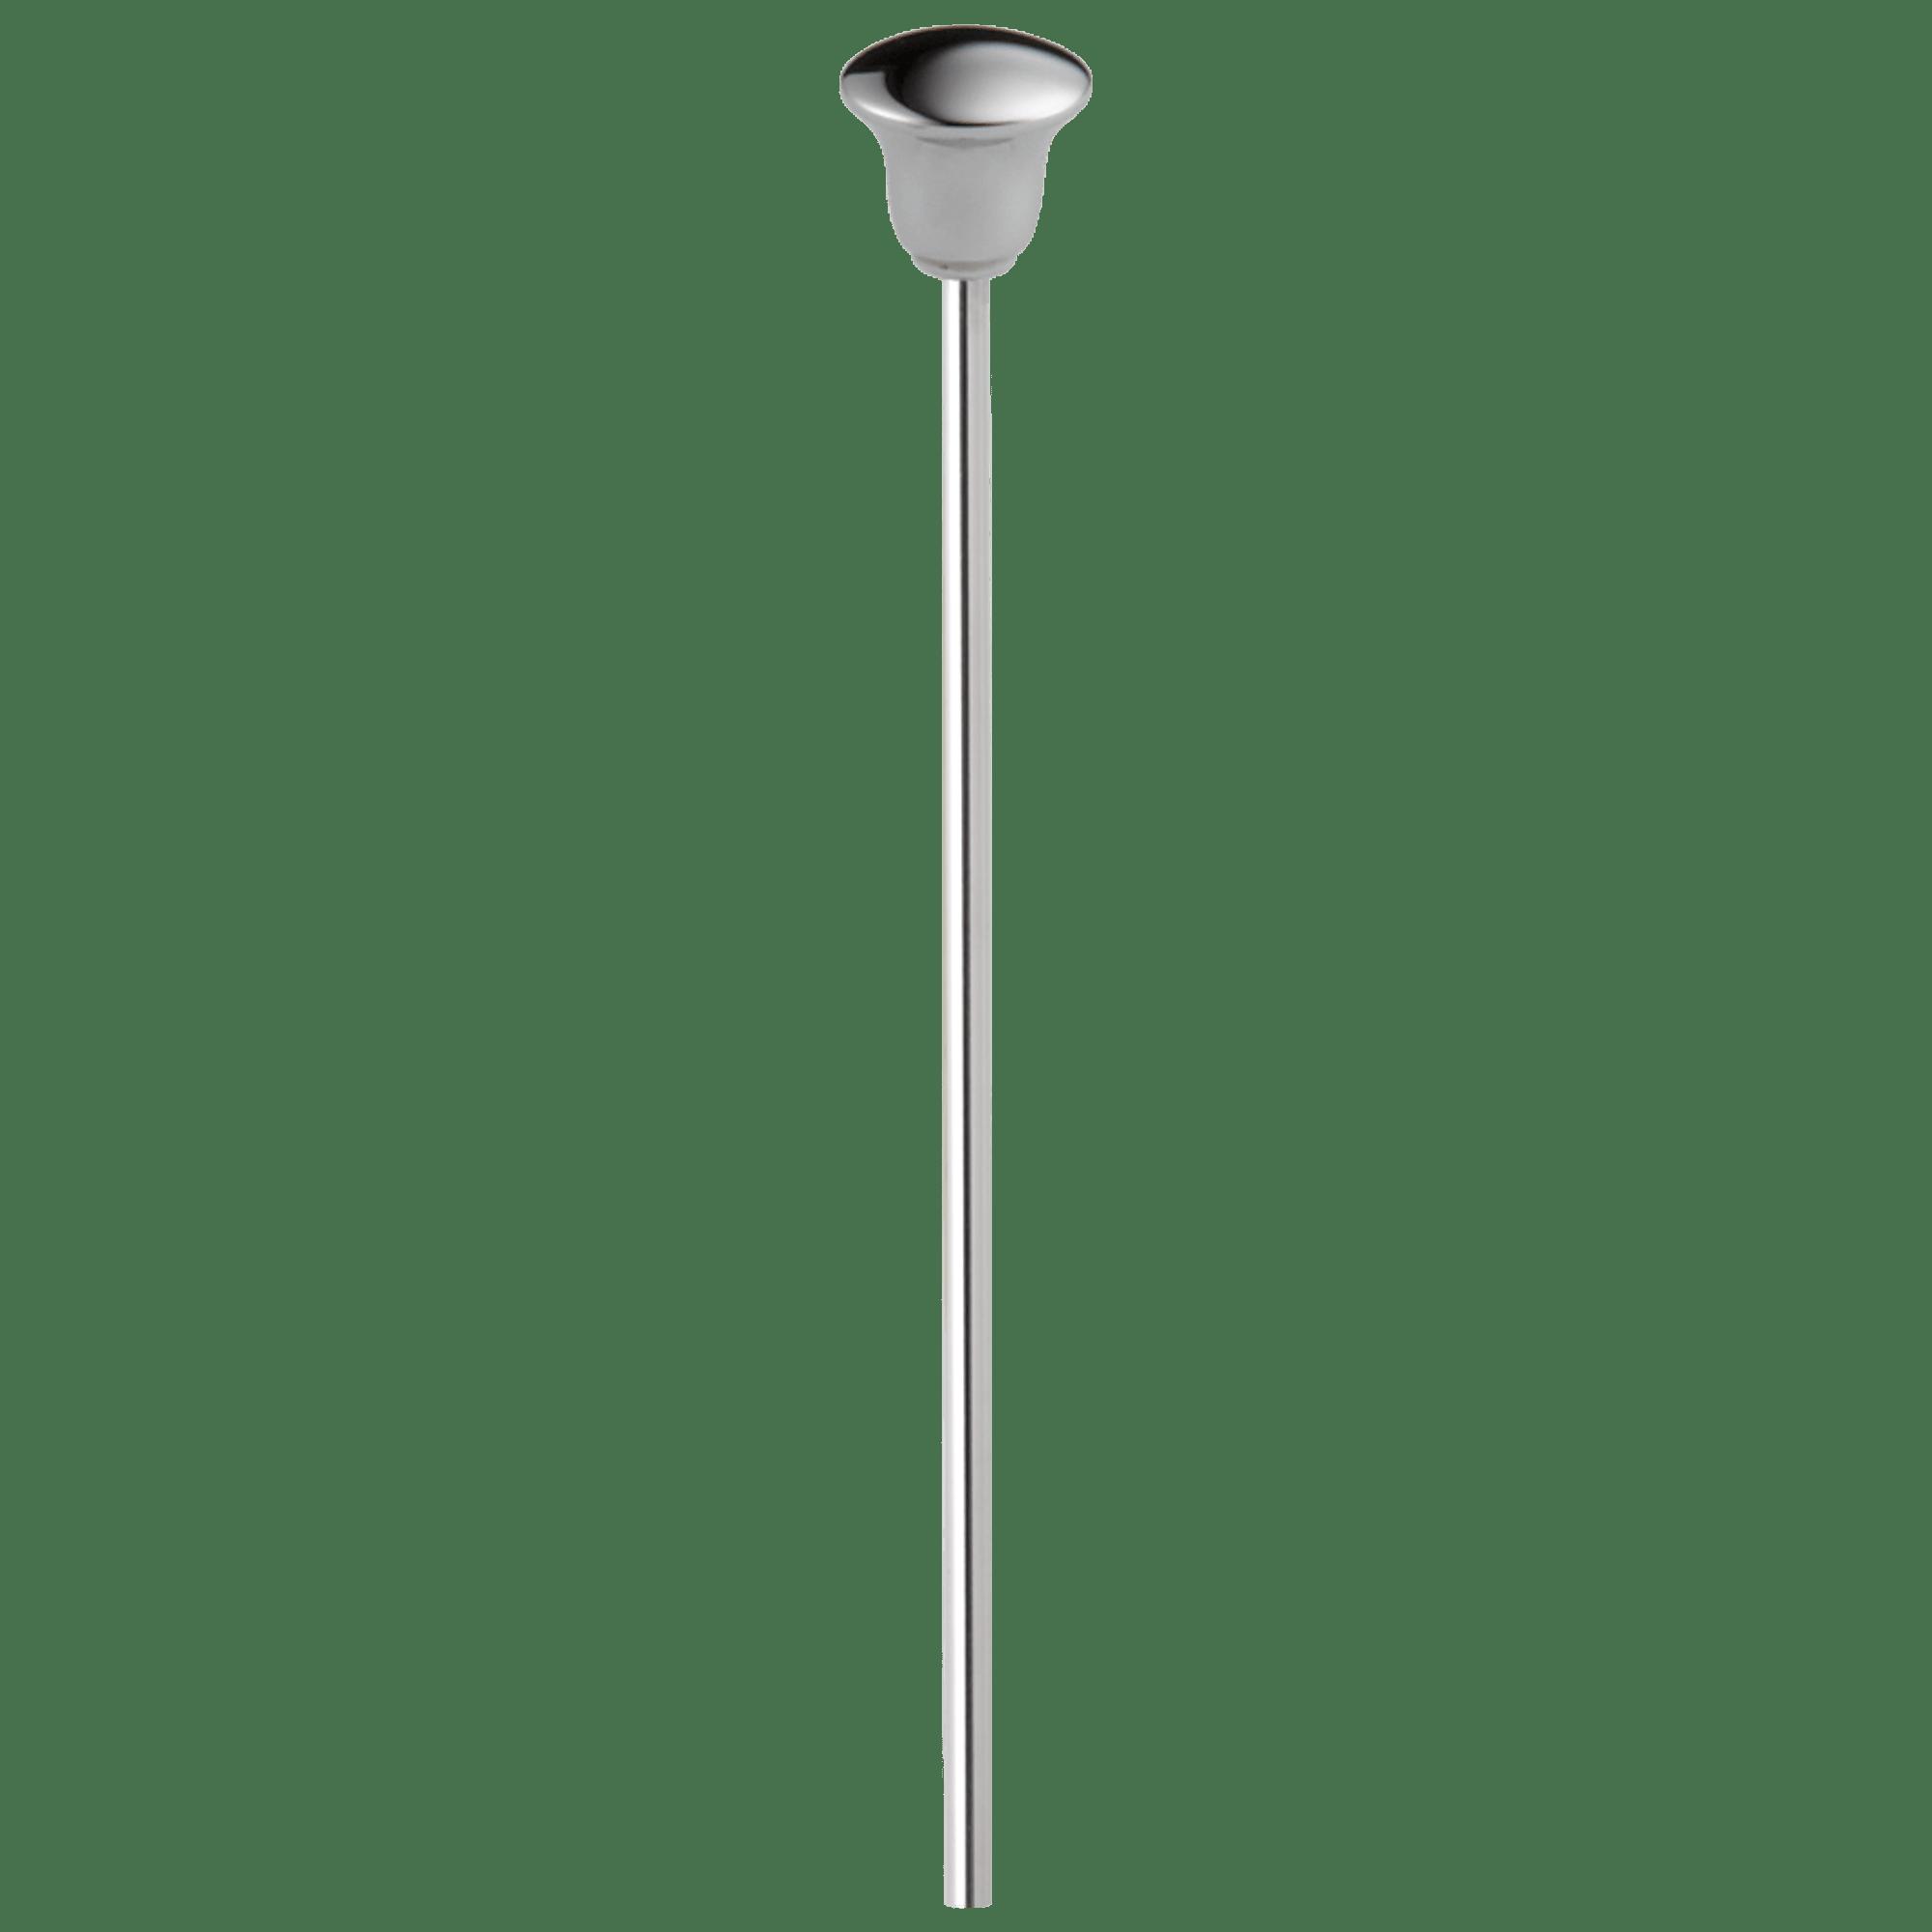 lift rod finial diverter roman tub